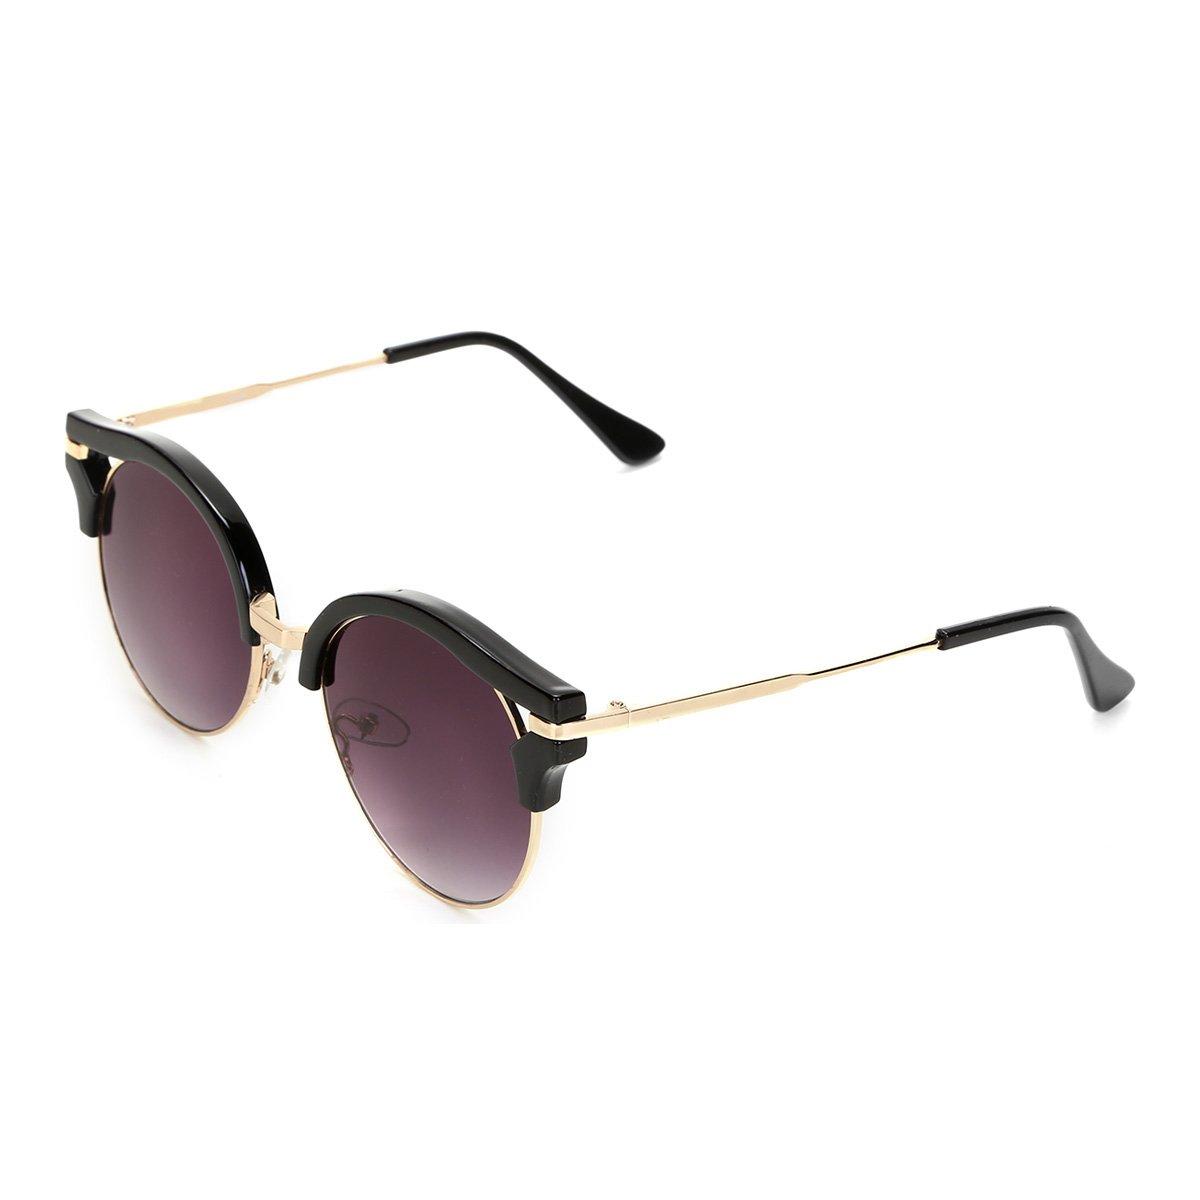 1eda18a52 ... Óculos de Sol King One J13 Feminino